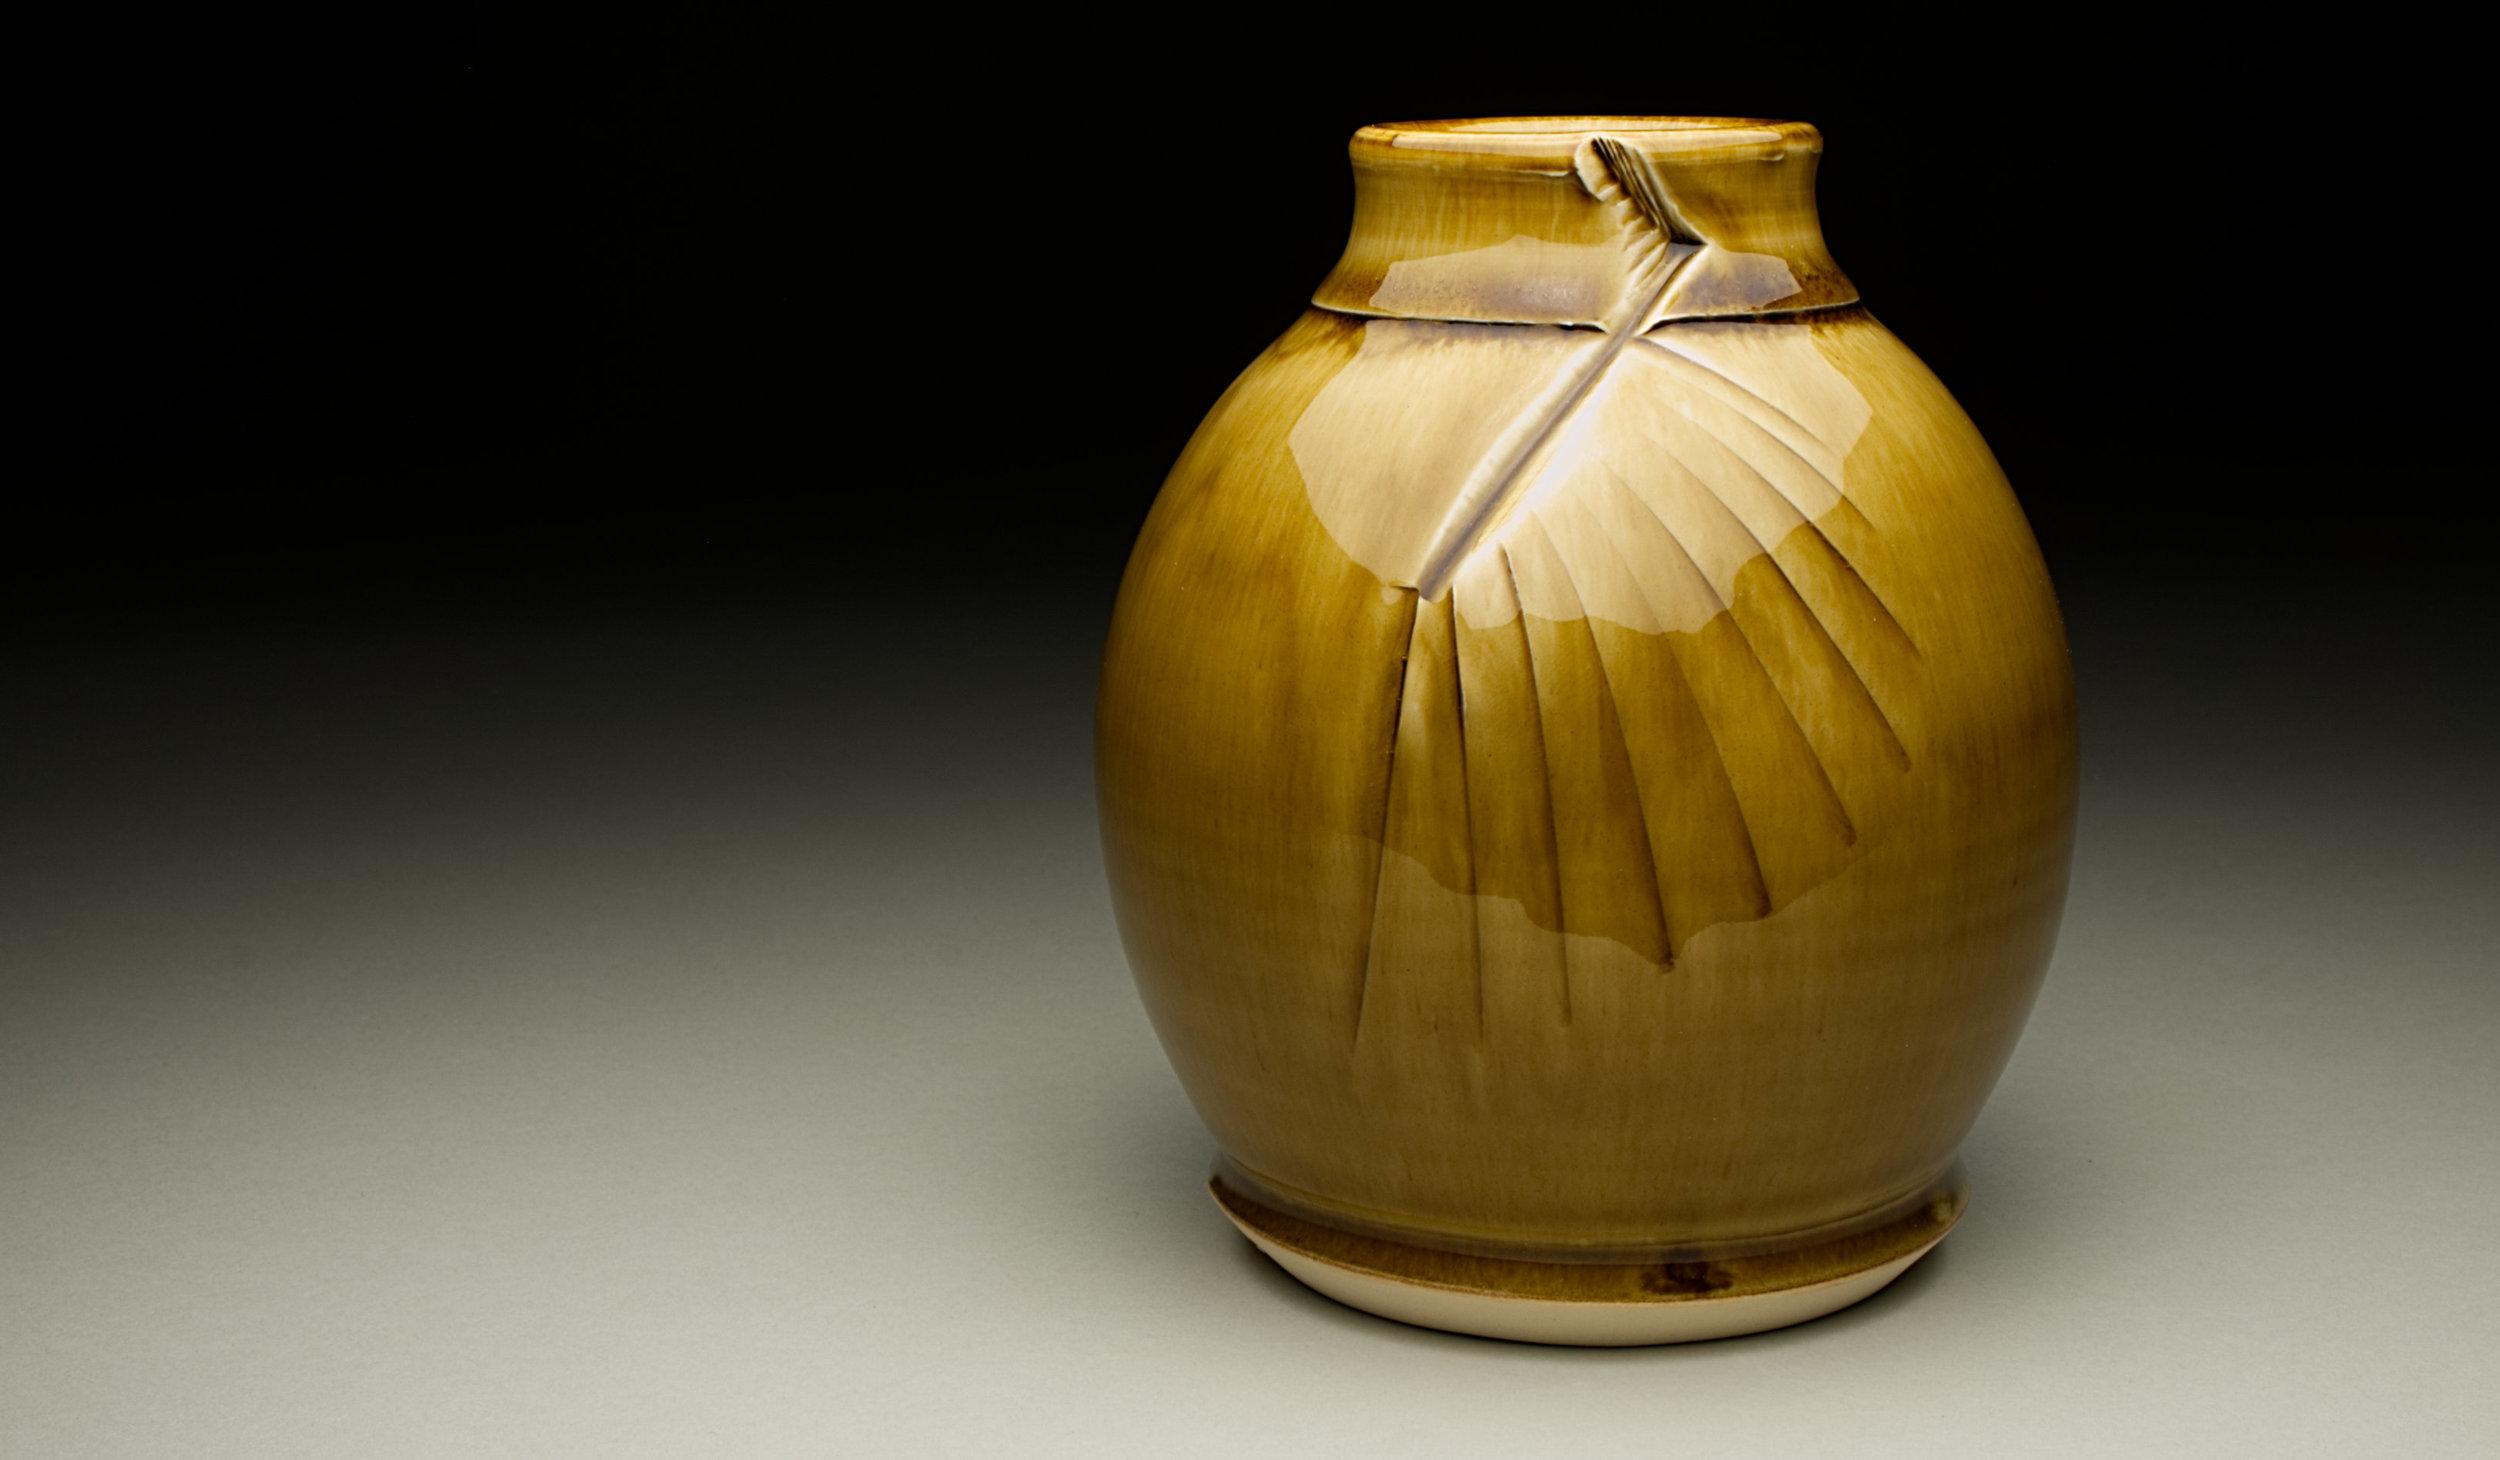 """Vase"" by Alex Adams, Ceramic,5.5x4.4x4.5in, 2017, $55"